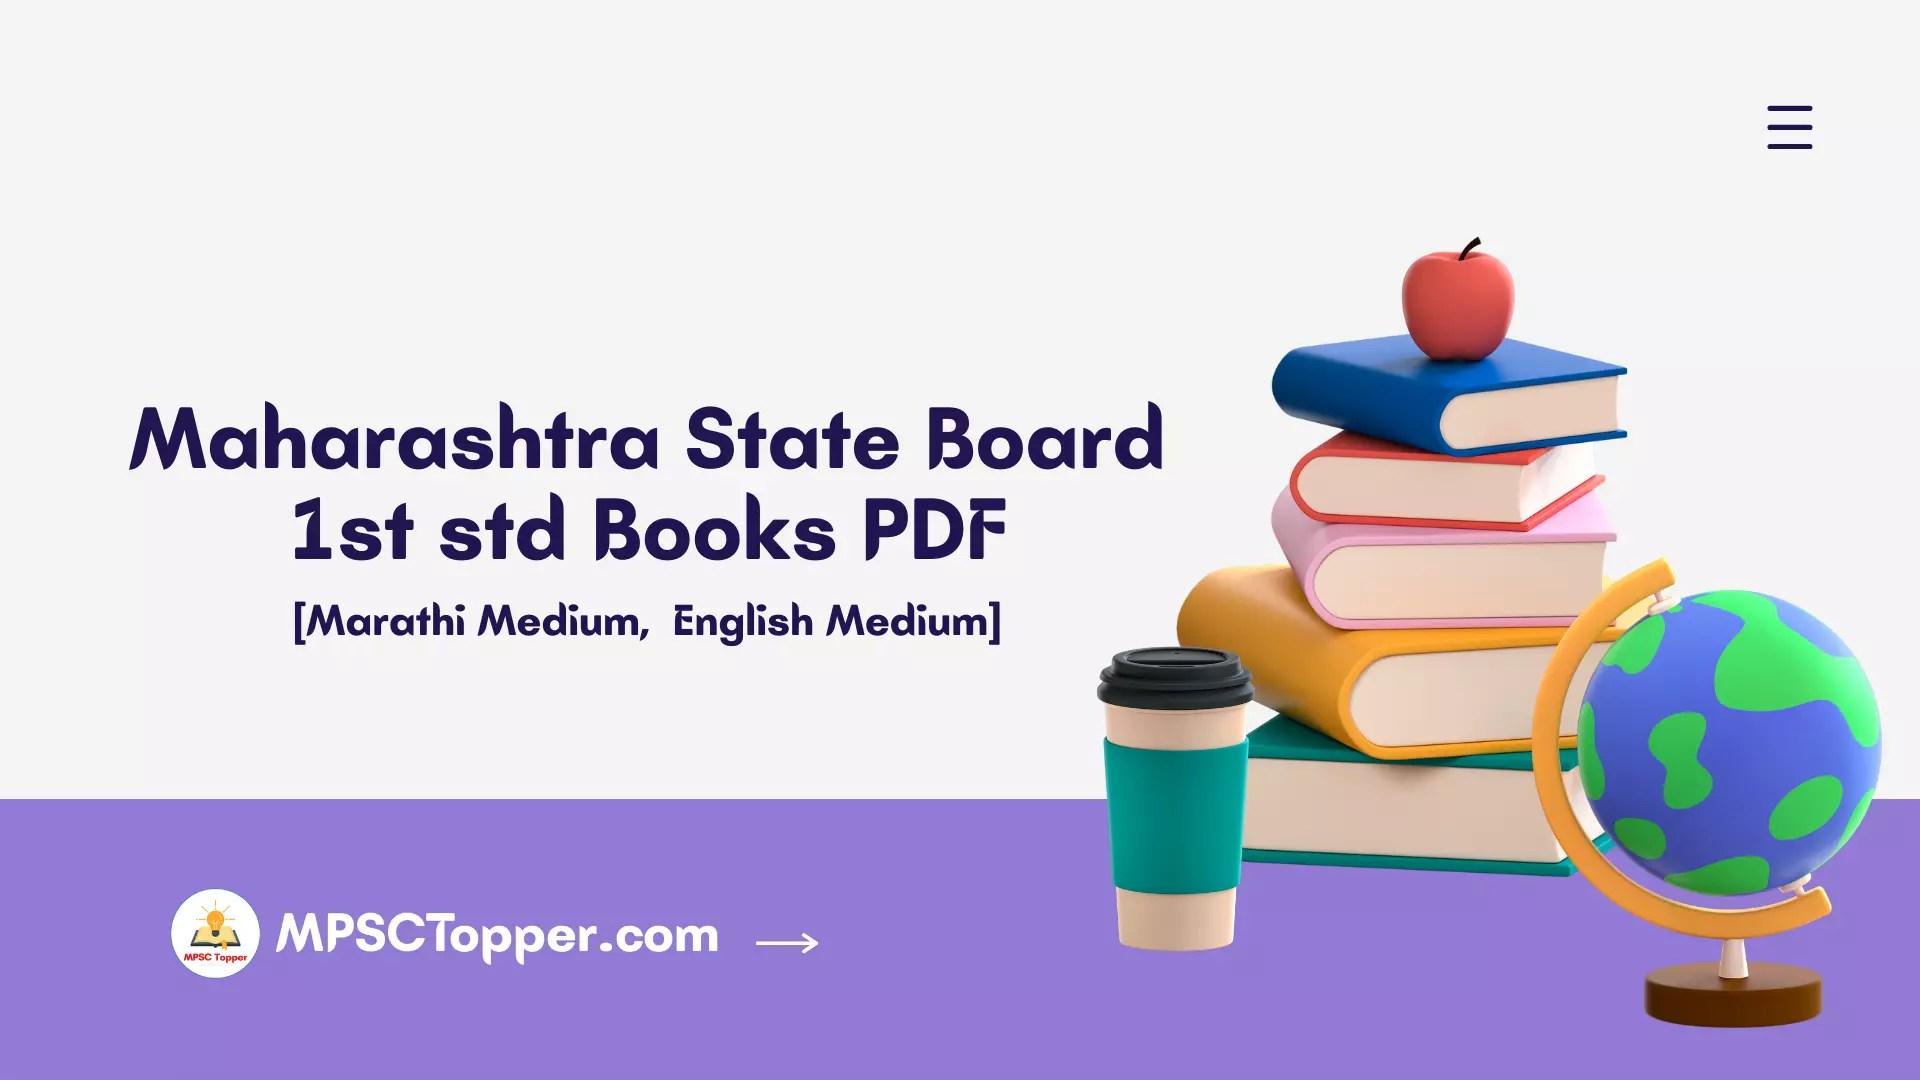 1st std Books PDF